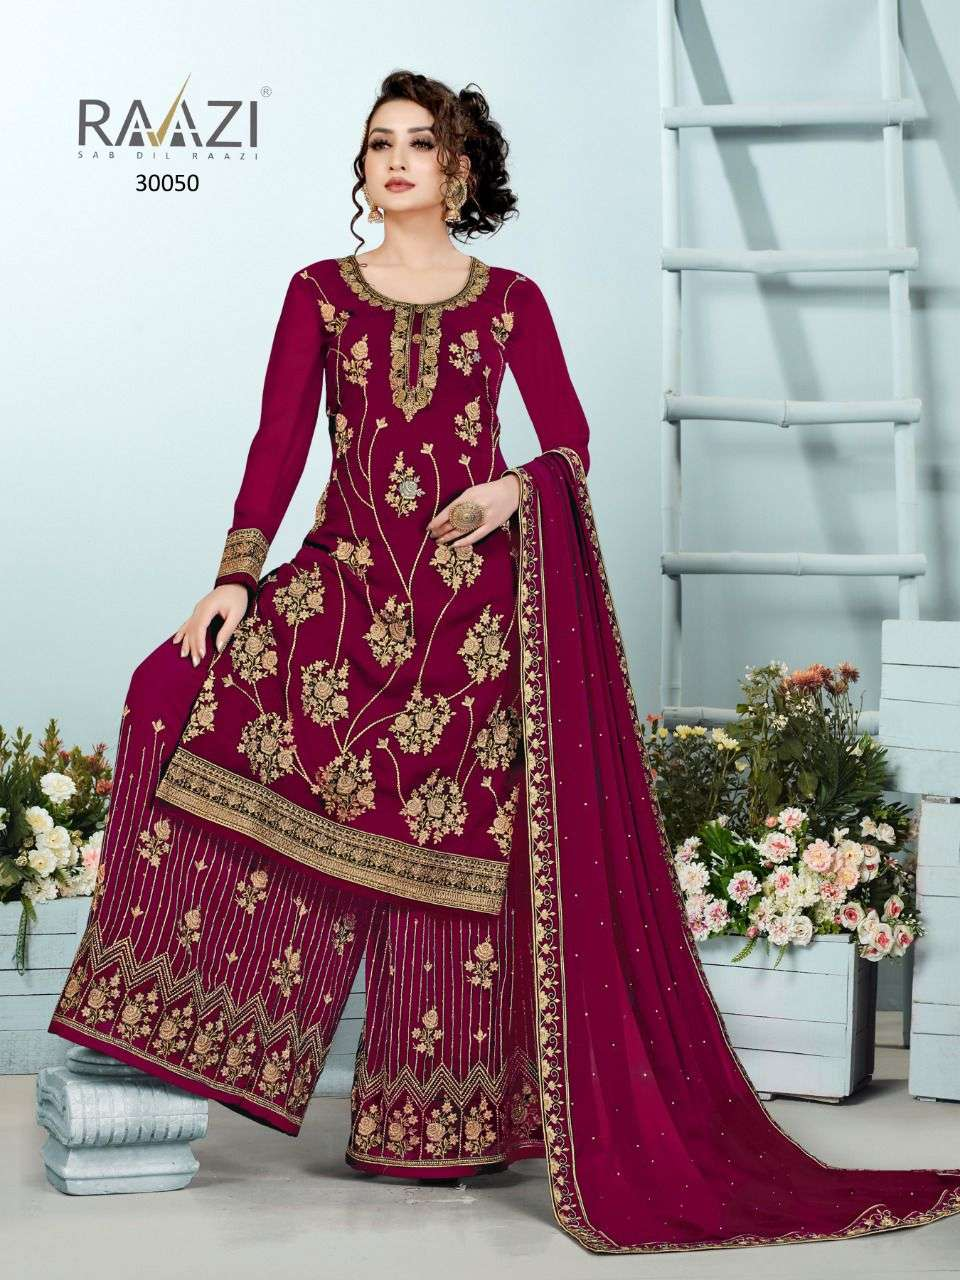 Rama fashion Dilbaro Vol 4 Plazzo Style Salwar kameez New Catalog at Best Rate